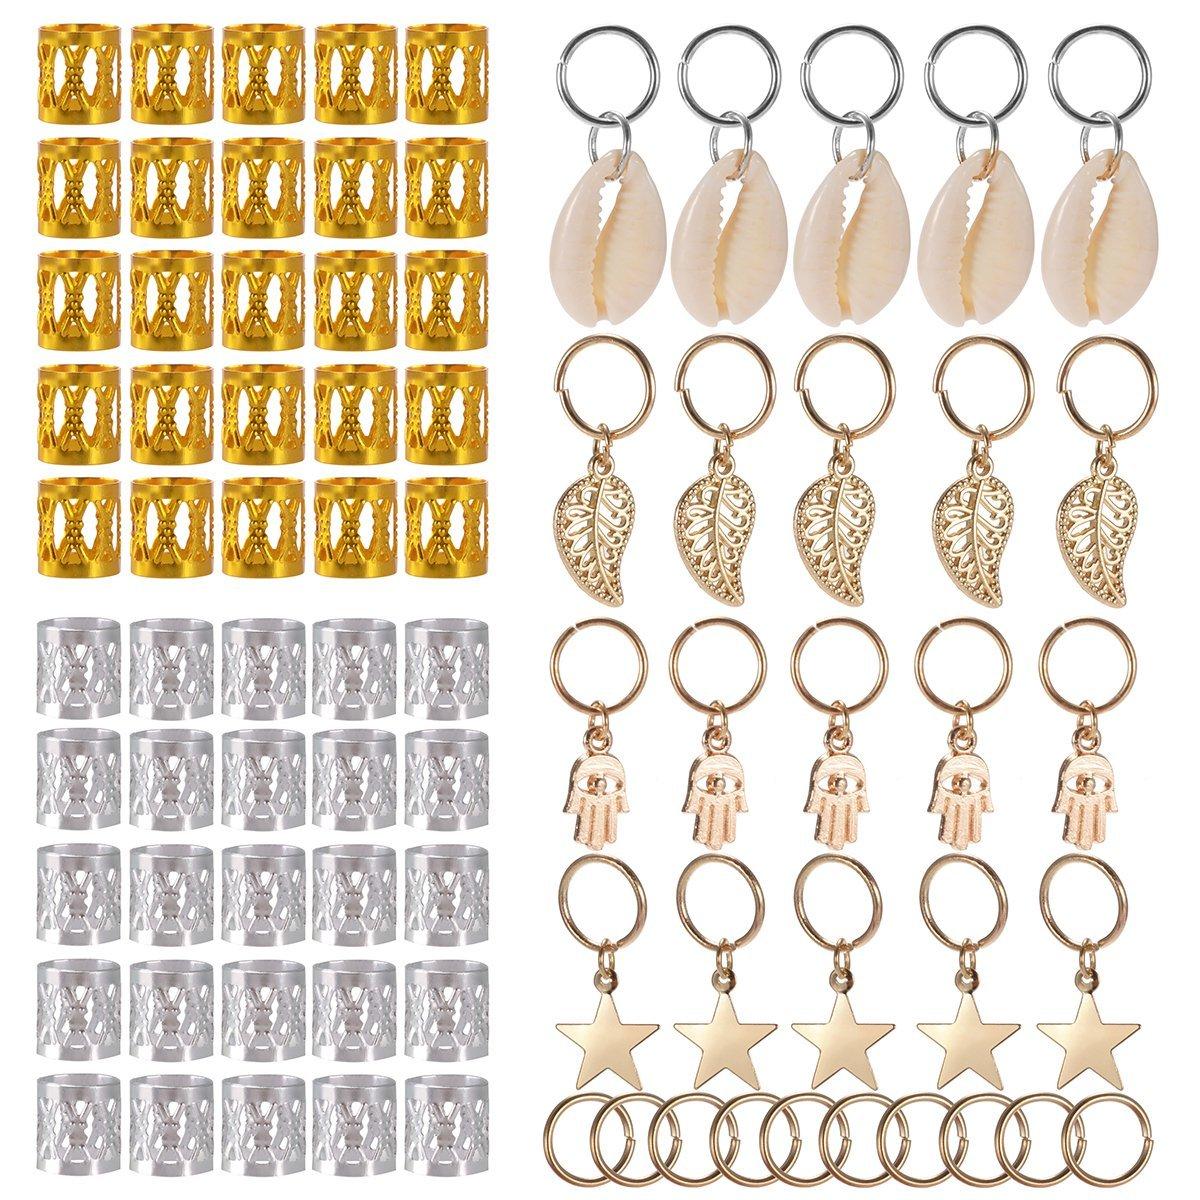 10x Metal Dreadlock Hair Rings Cuffs Beard Hair Decors Jewel Beads Pendants